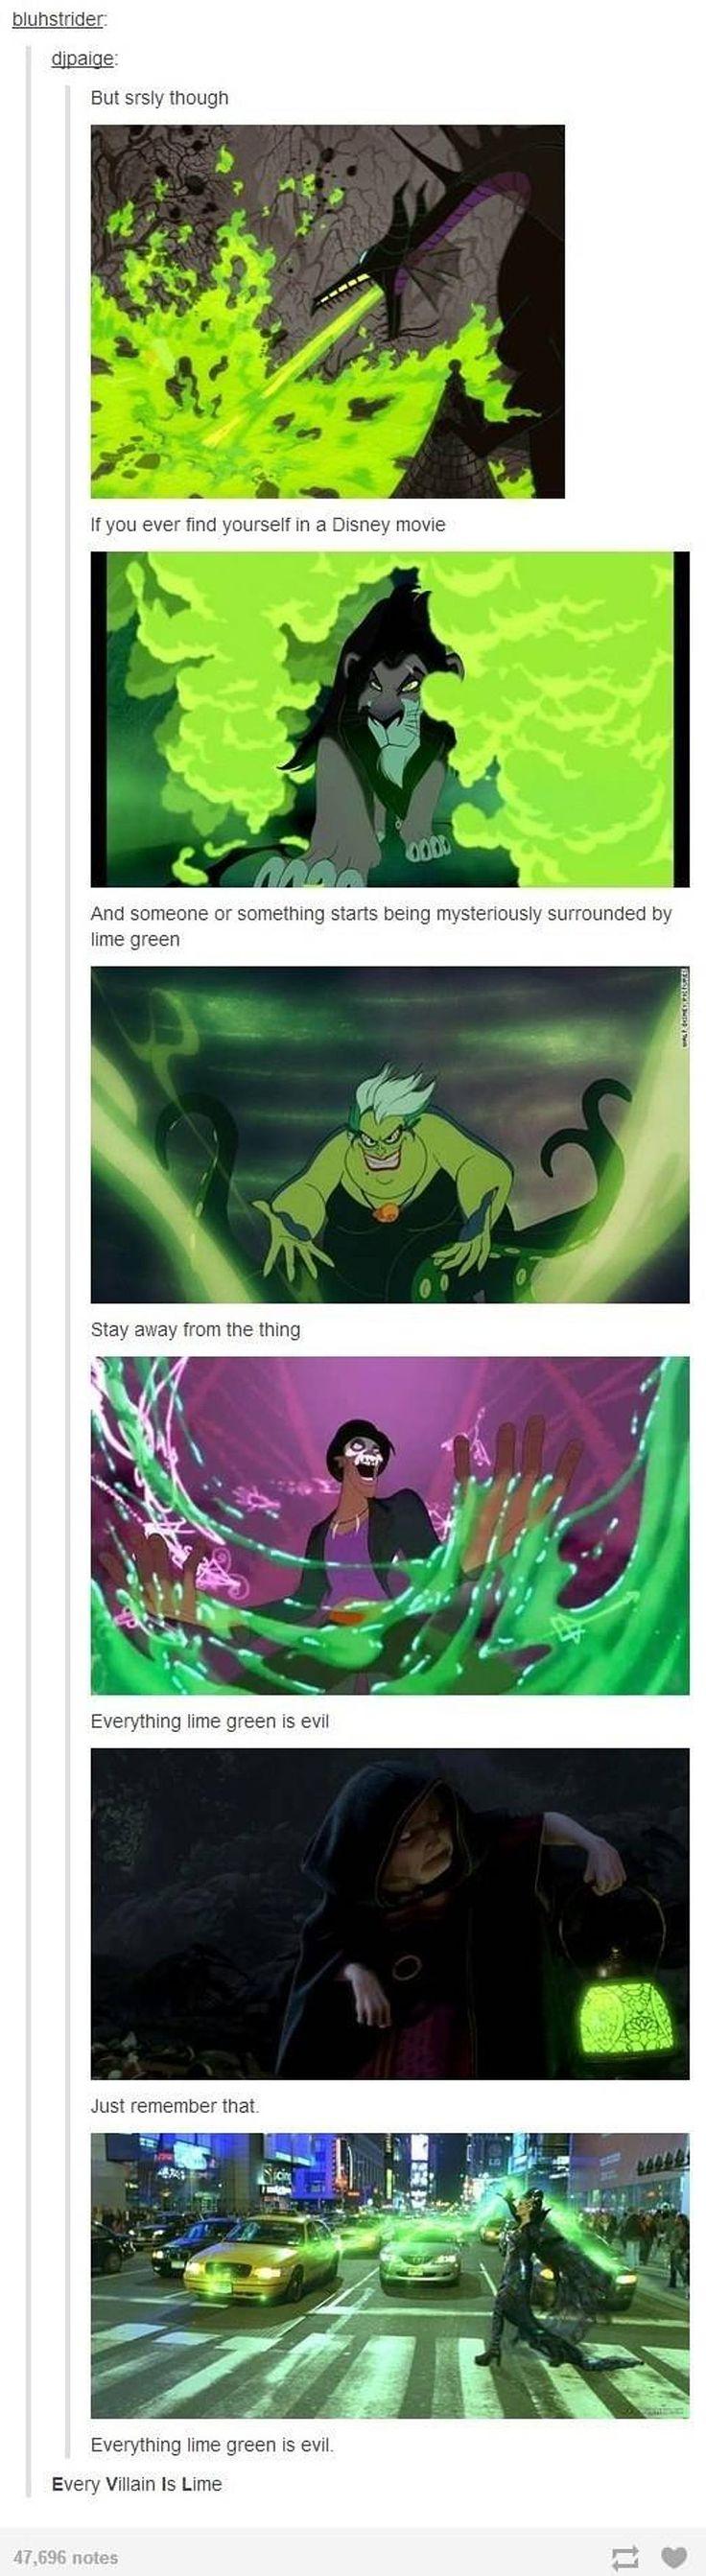 Marvel owned by Disney marvel - loki - GREEN EVERYWHERE